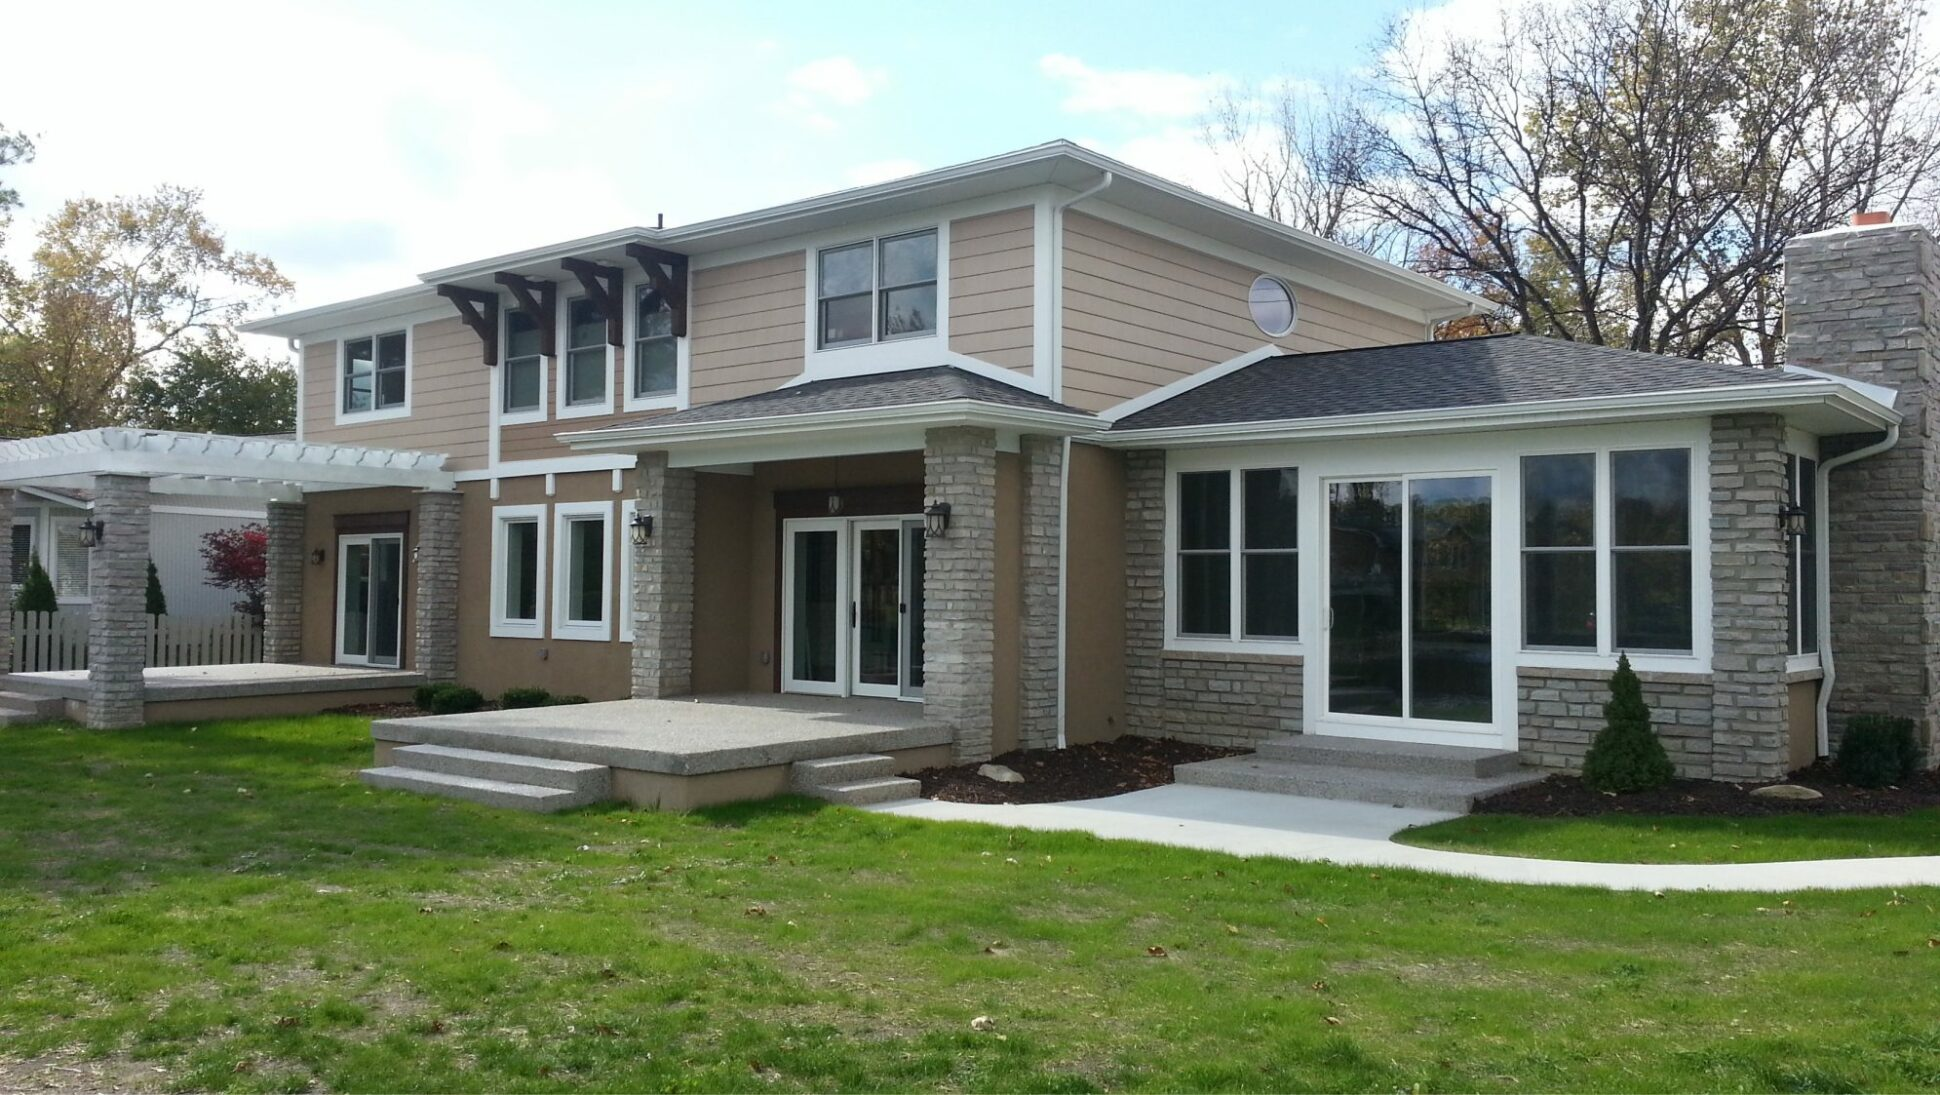 Design_Build_New_Home_Construction_Lake_Fenton_MI